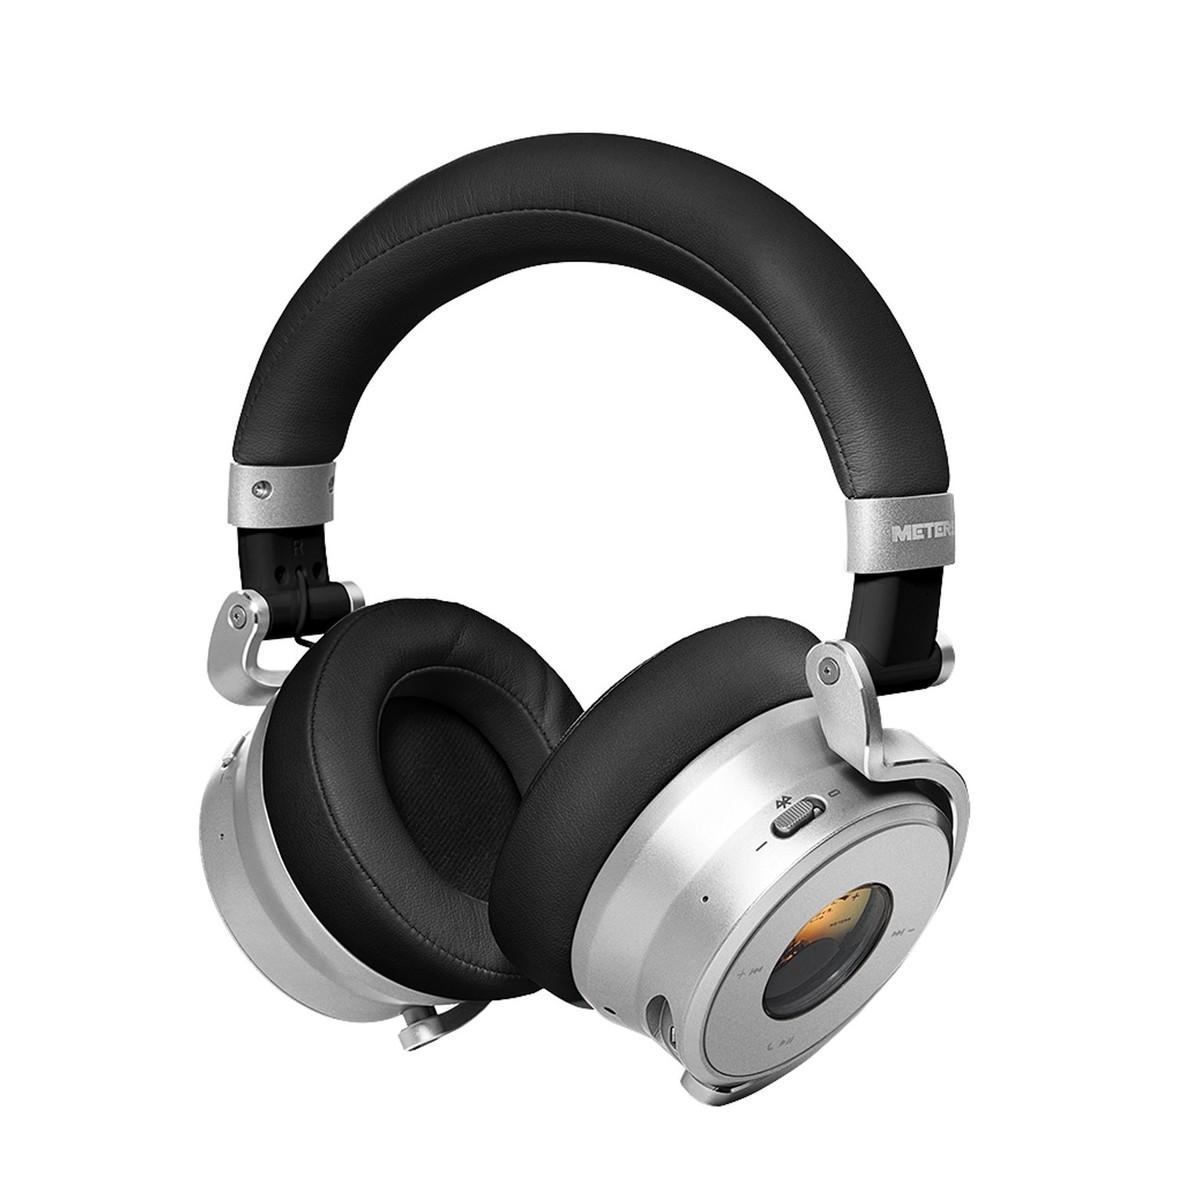 eb8bebe78f9 Meter OV-1-B Bluetooth Over Ear Headphones, Black - Main. Loading zoom